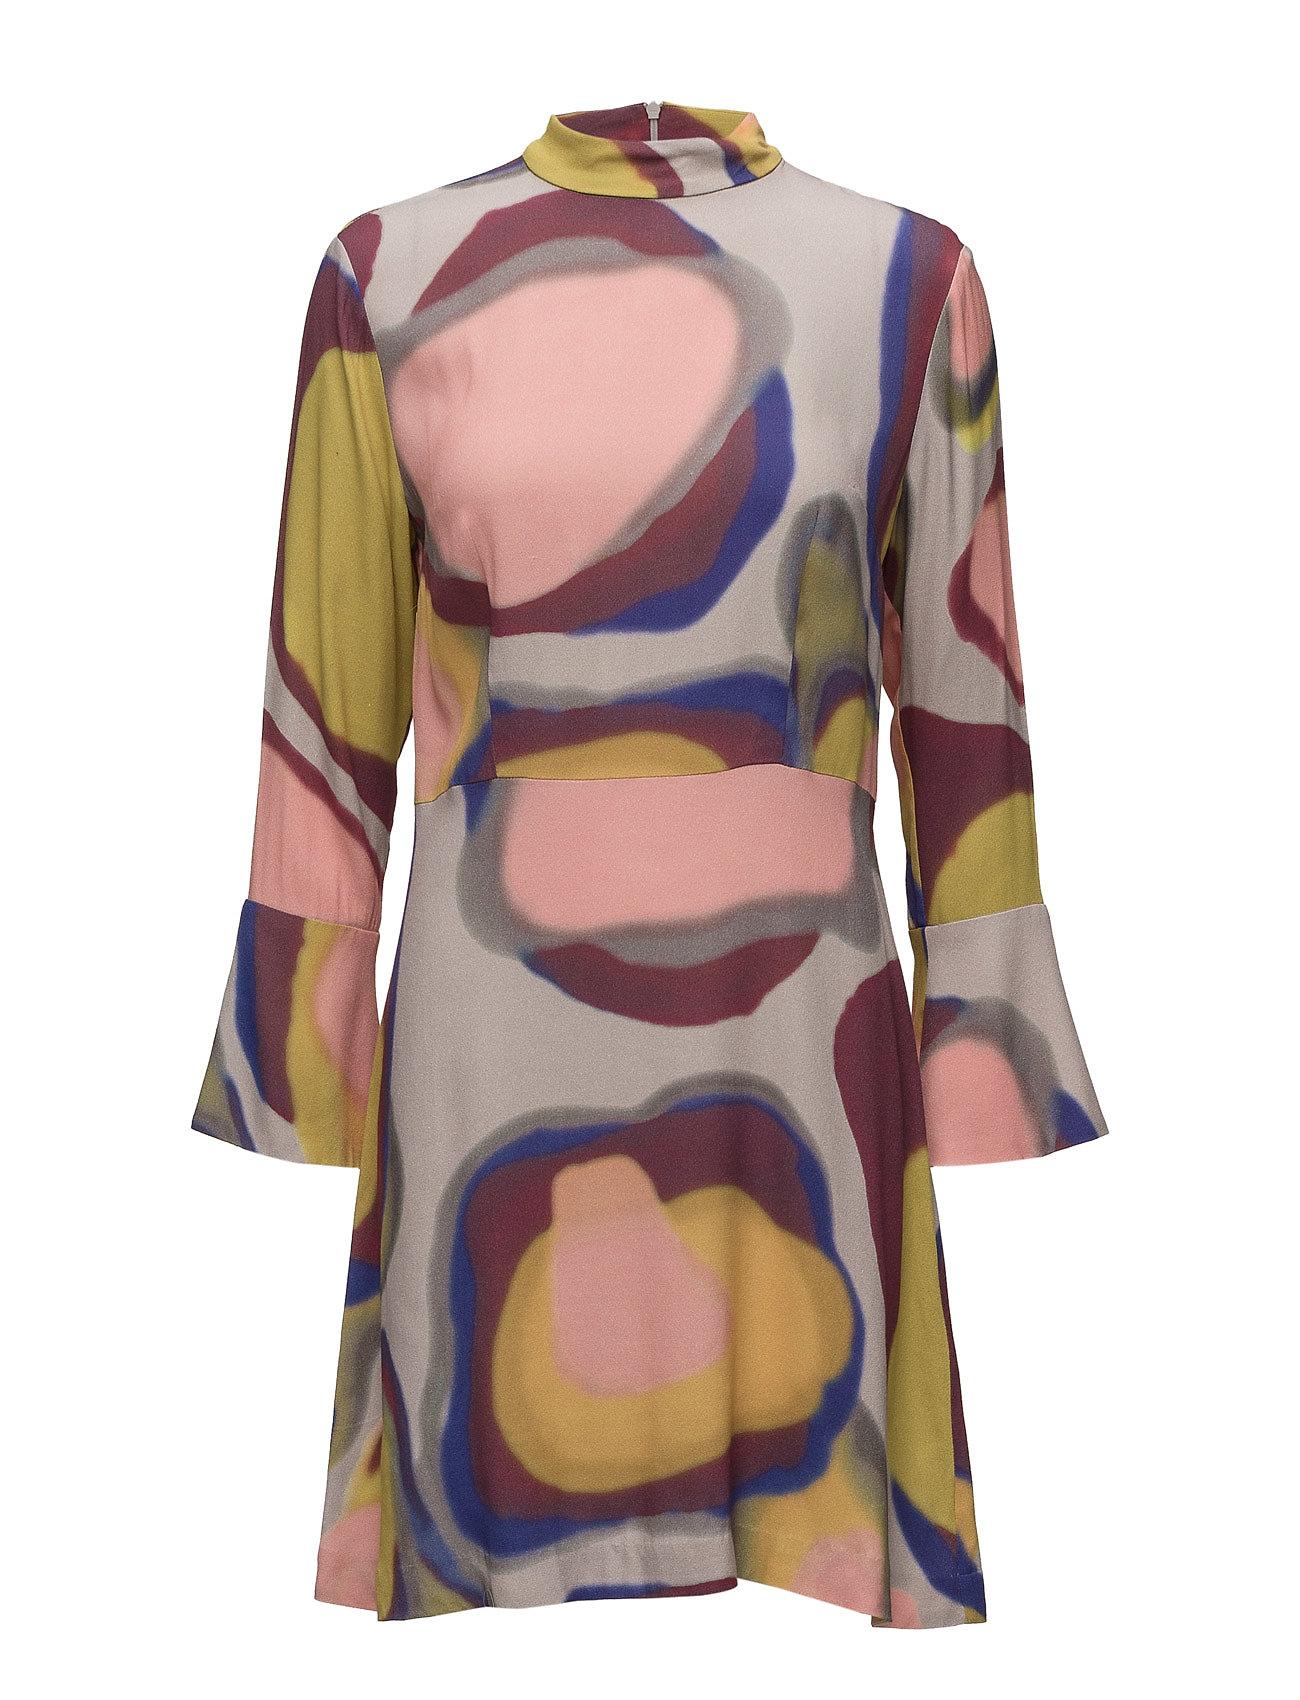 2nd Bine Printed 2NDDAY Dresses thumbnail